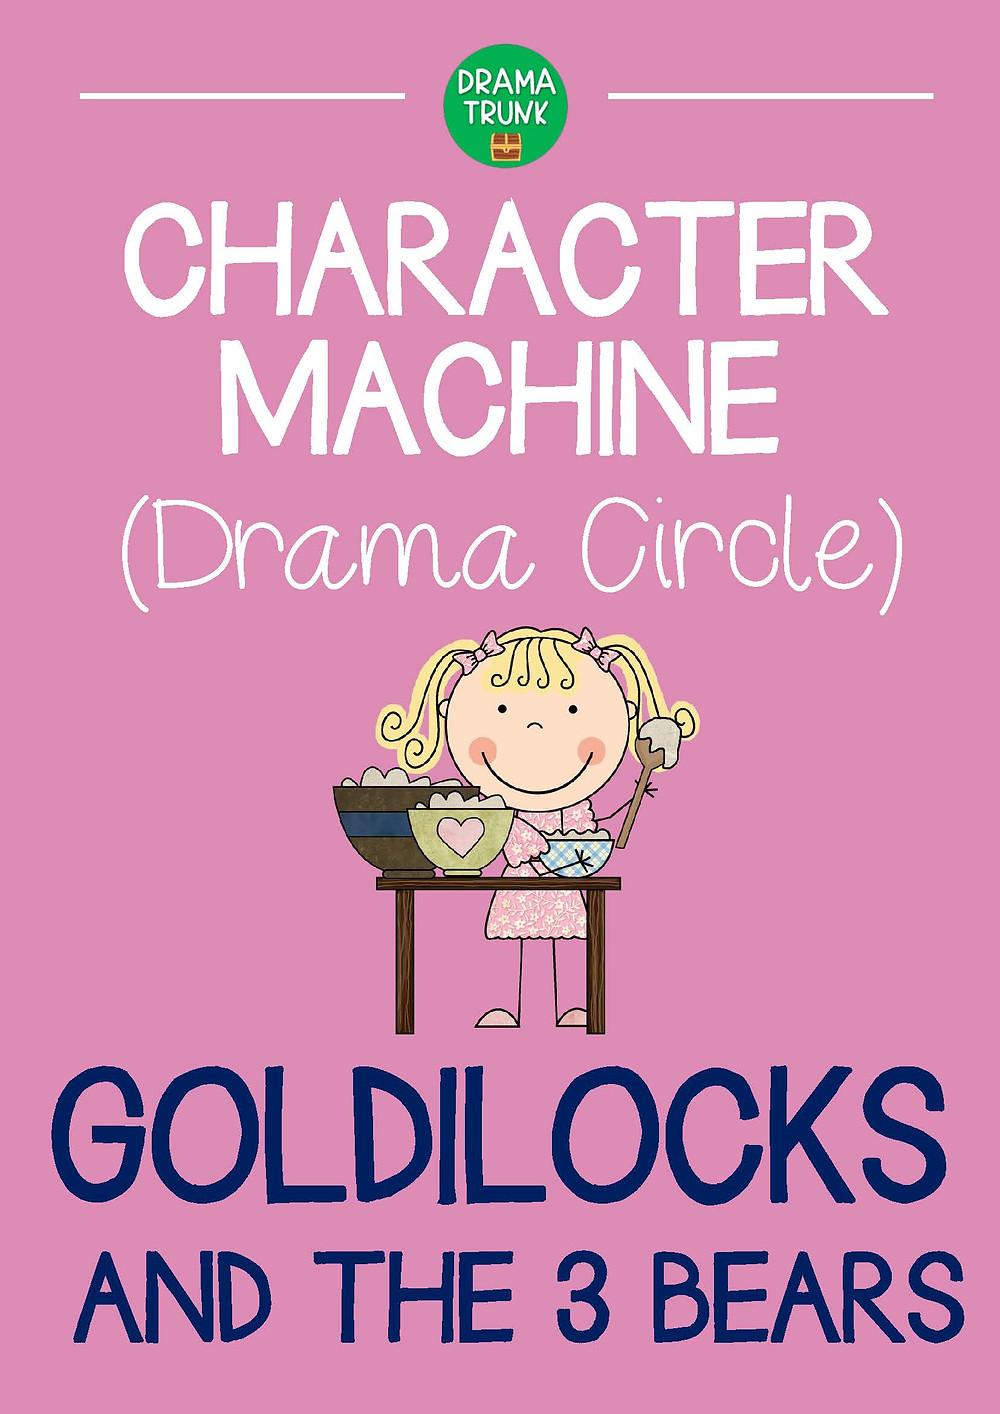 Goldilocks and the 3 Bears Drama Circle Readers Theatre Script for Kids